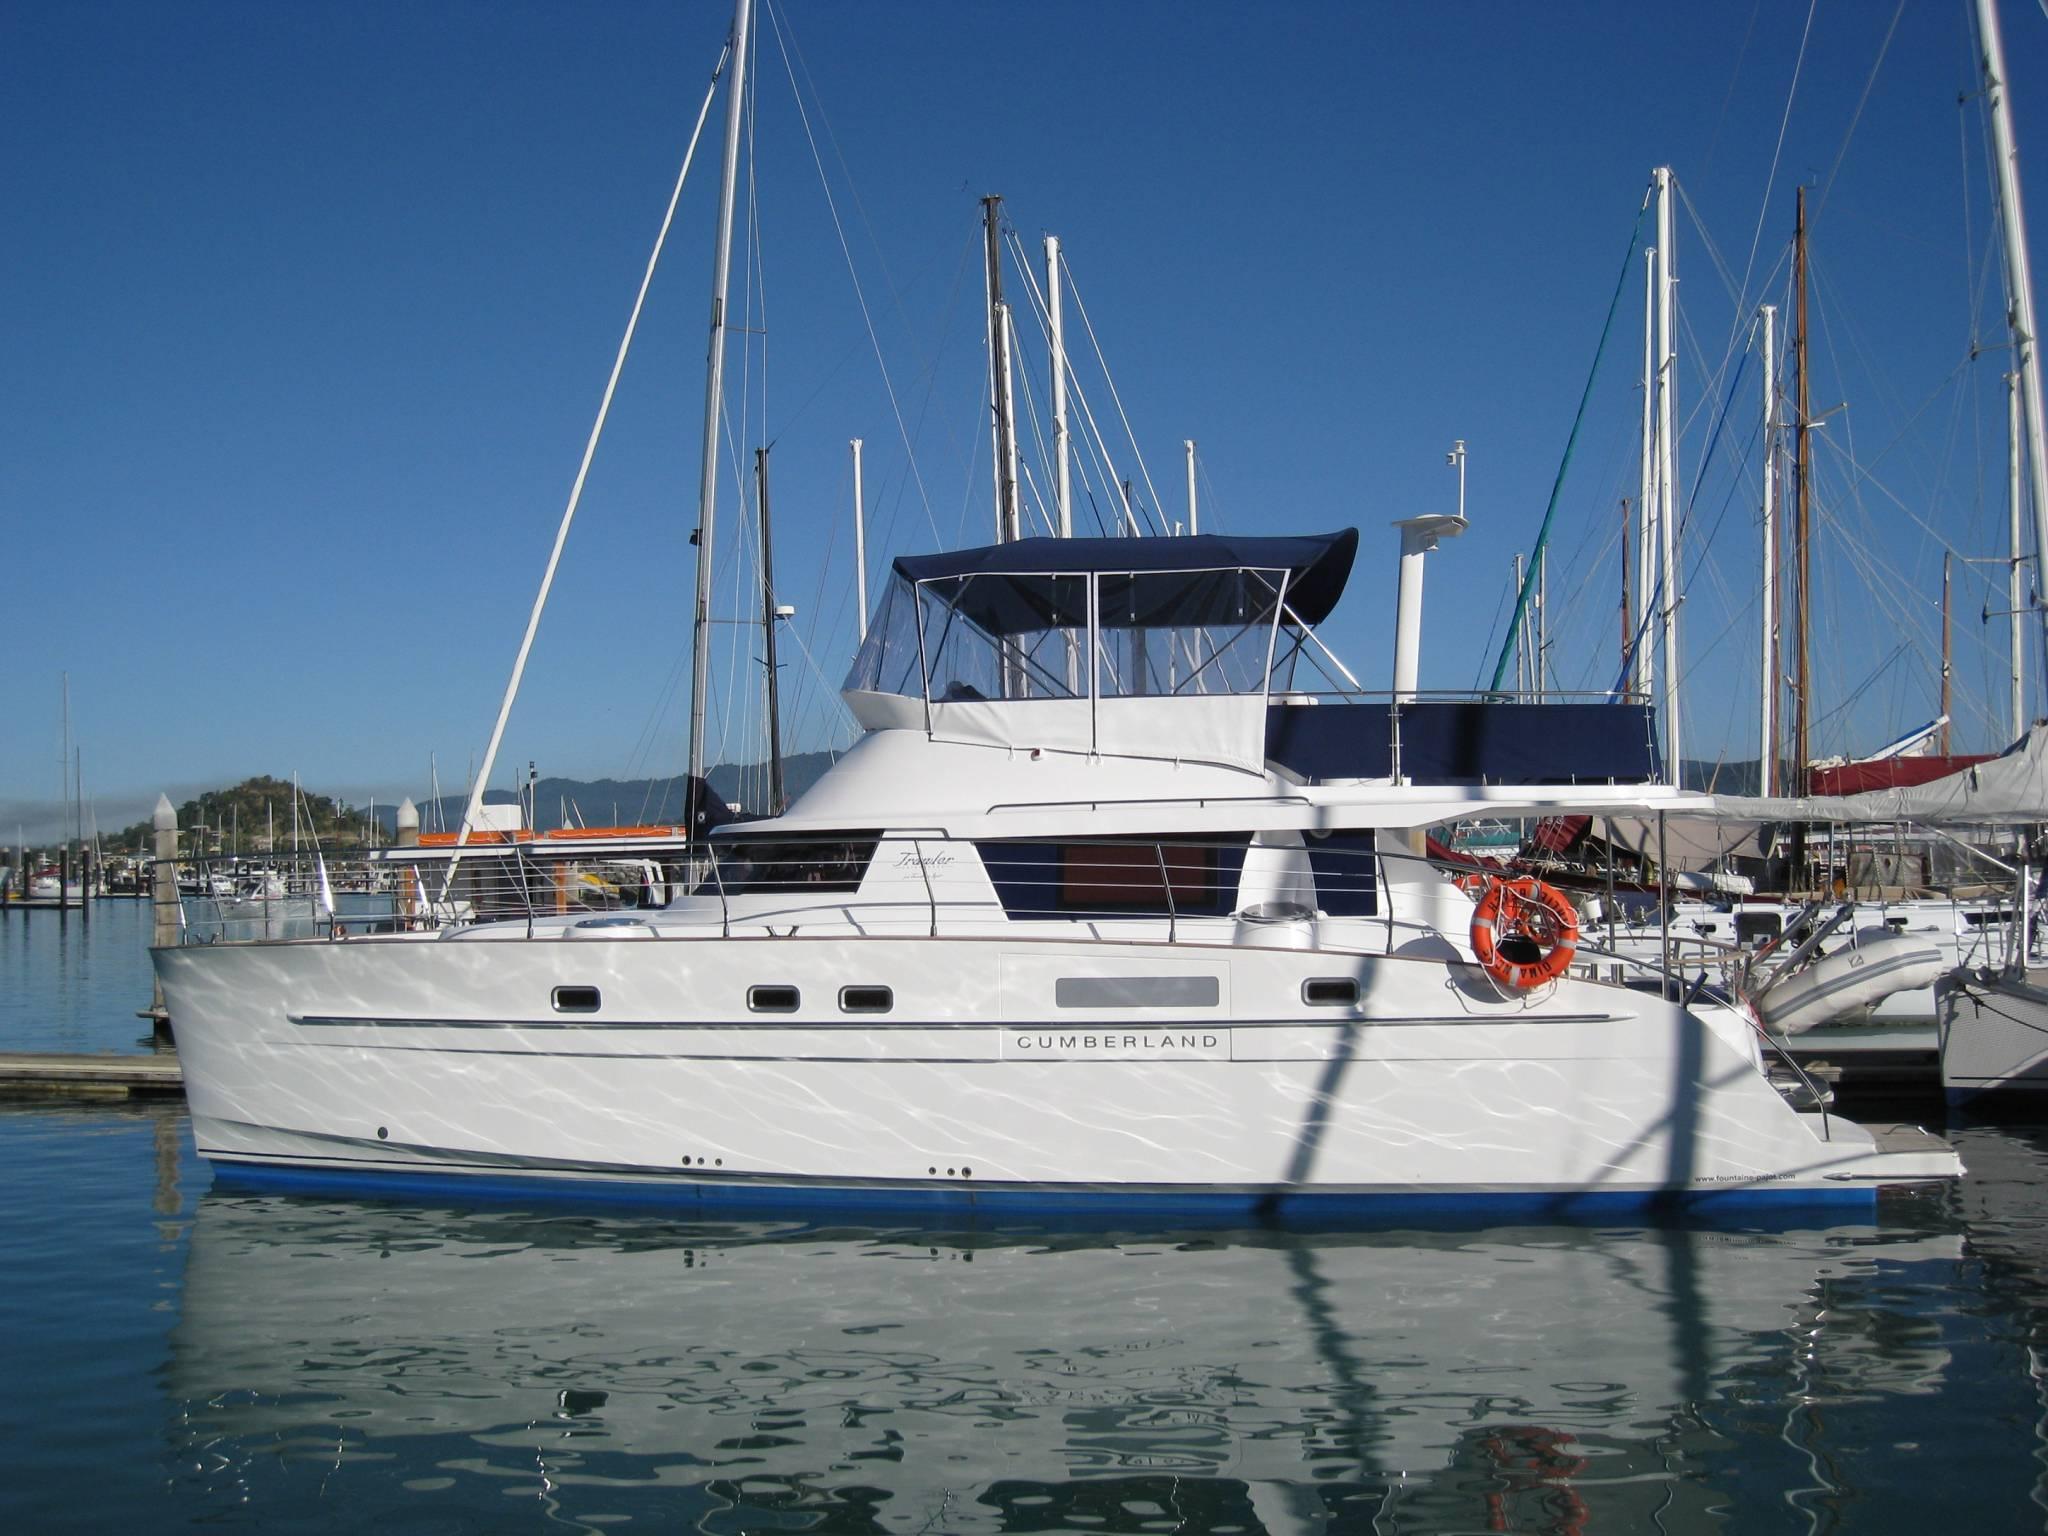 Fontaine Pajot Cumberland 46 Catamaran | Whitsunday Holidays